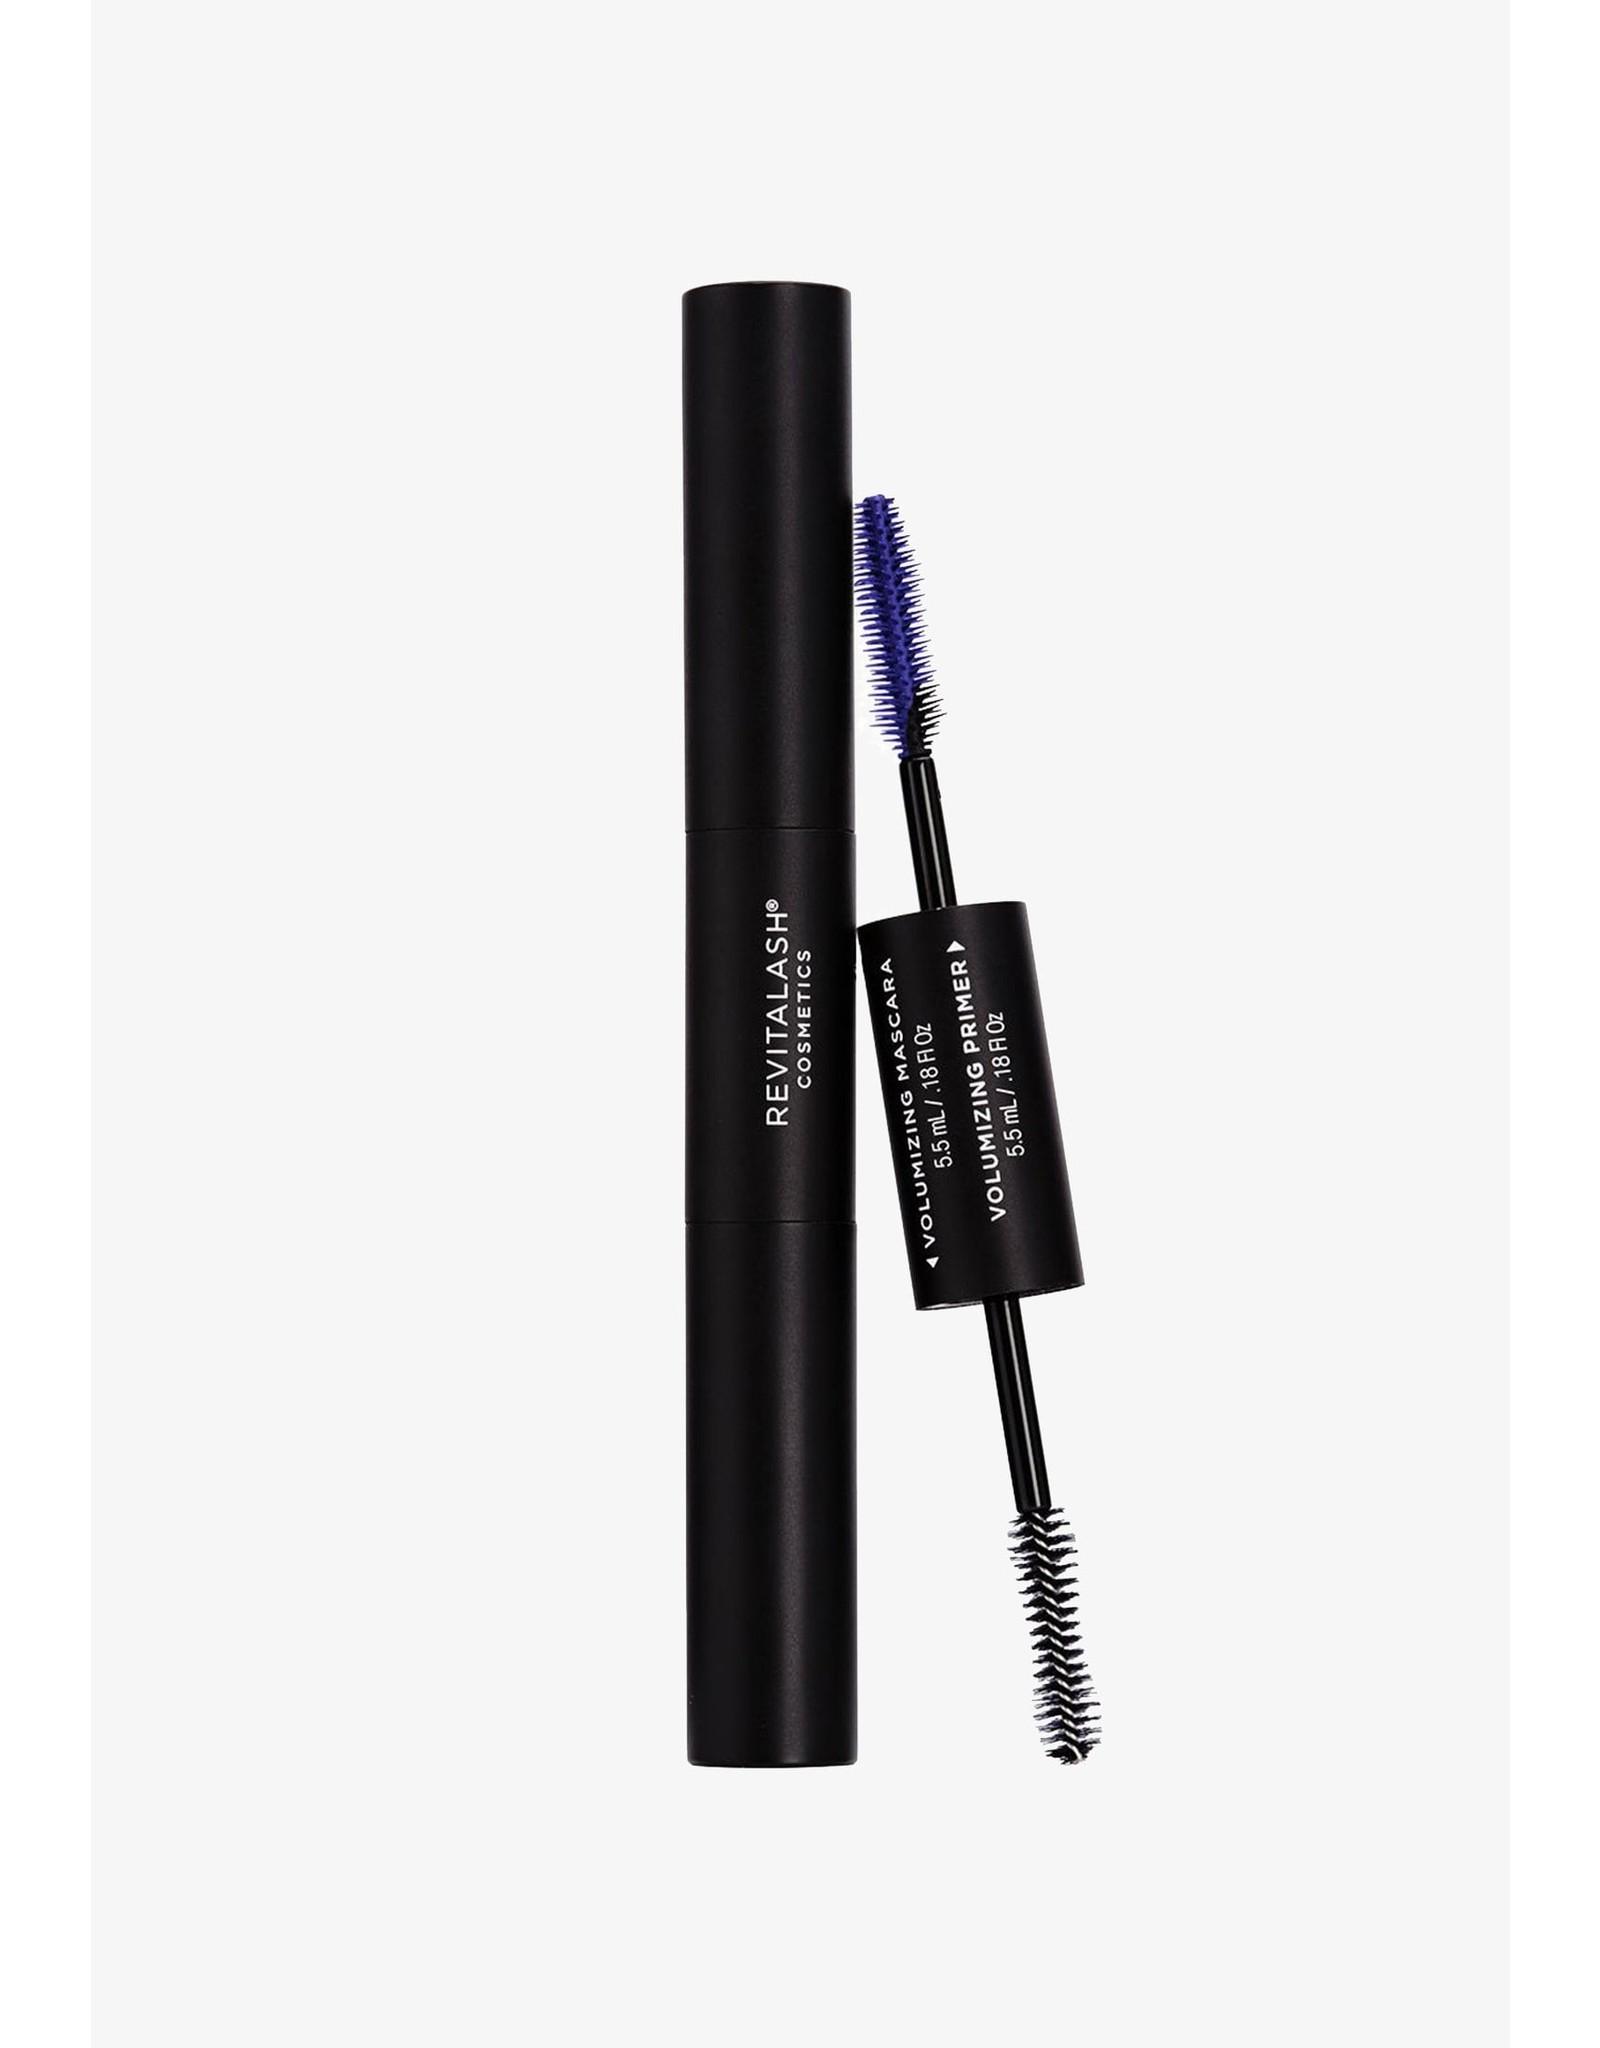 Revitalash Cosmetics Double Ended Volume Set (Primer / Mascara)